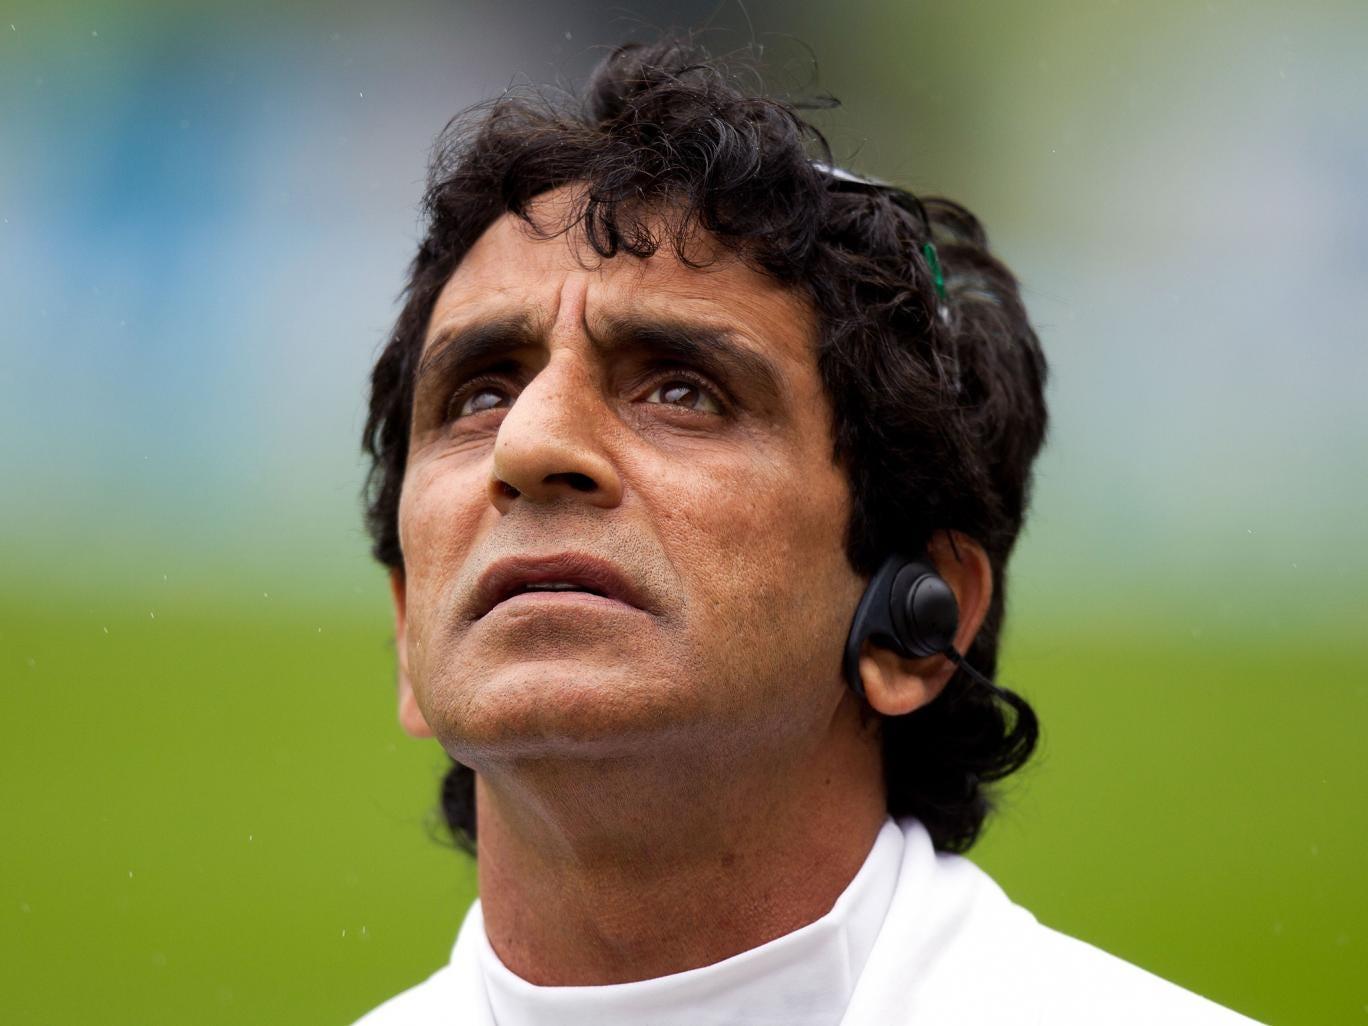 Umpire Asad Rauf from Pakistan